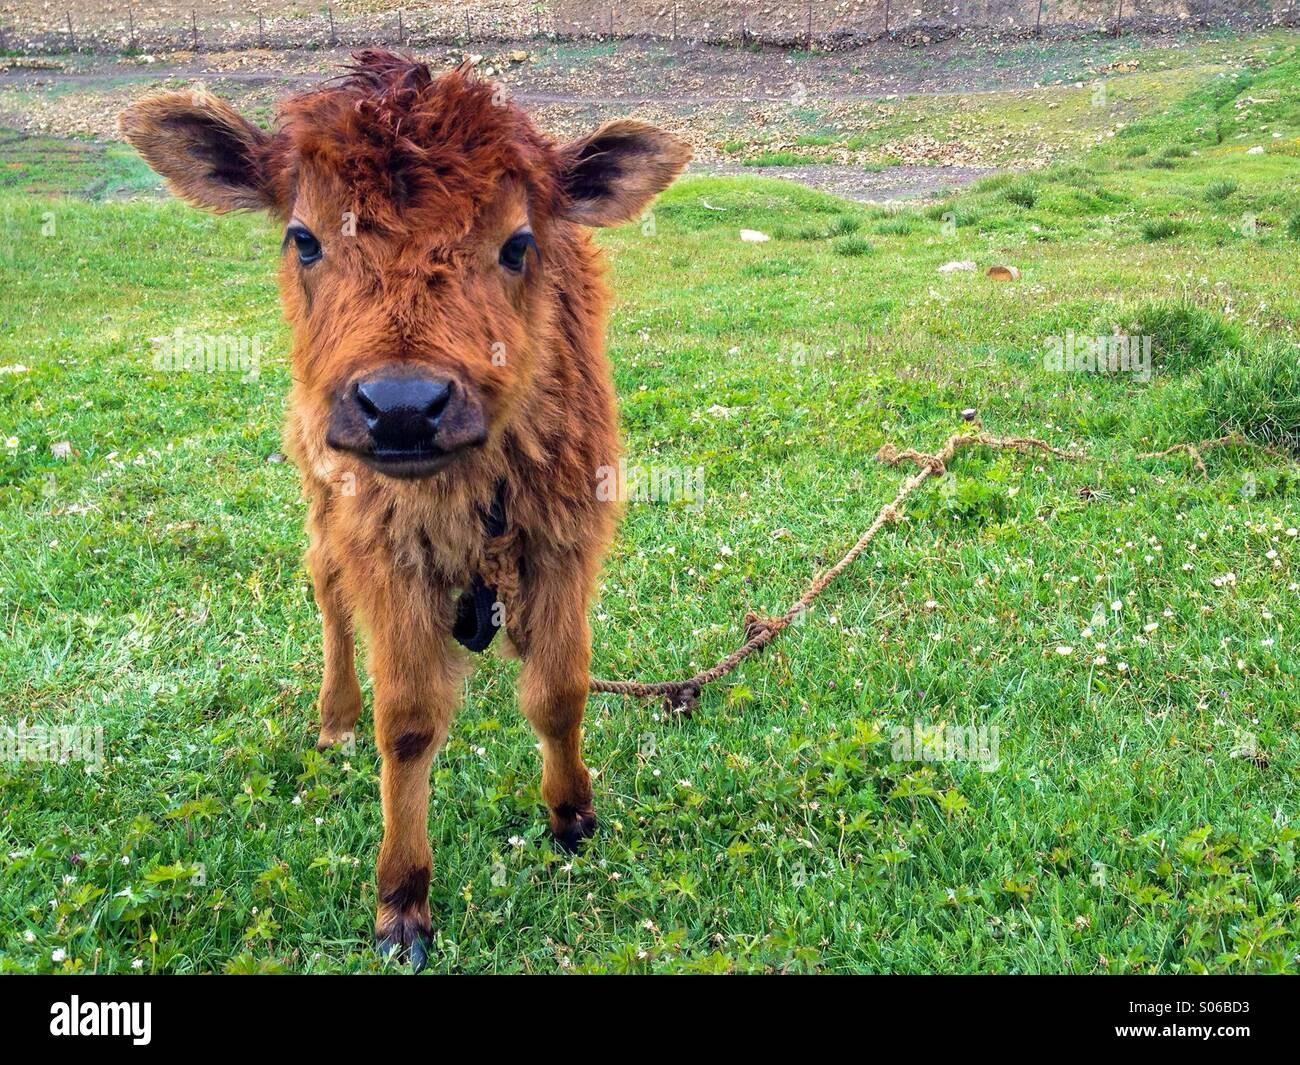 A cute calf in Hikkim village of Spiti, Himachal Pradesh, India - Stock Image